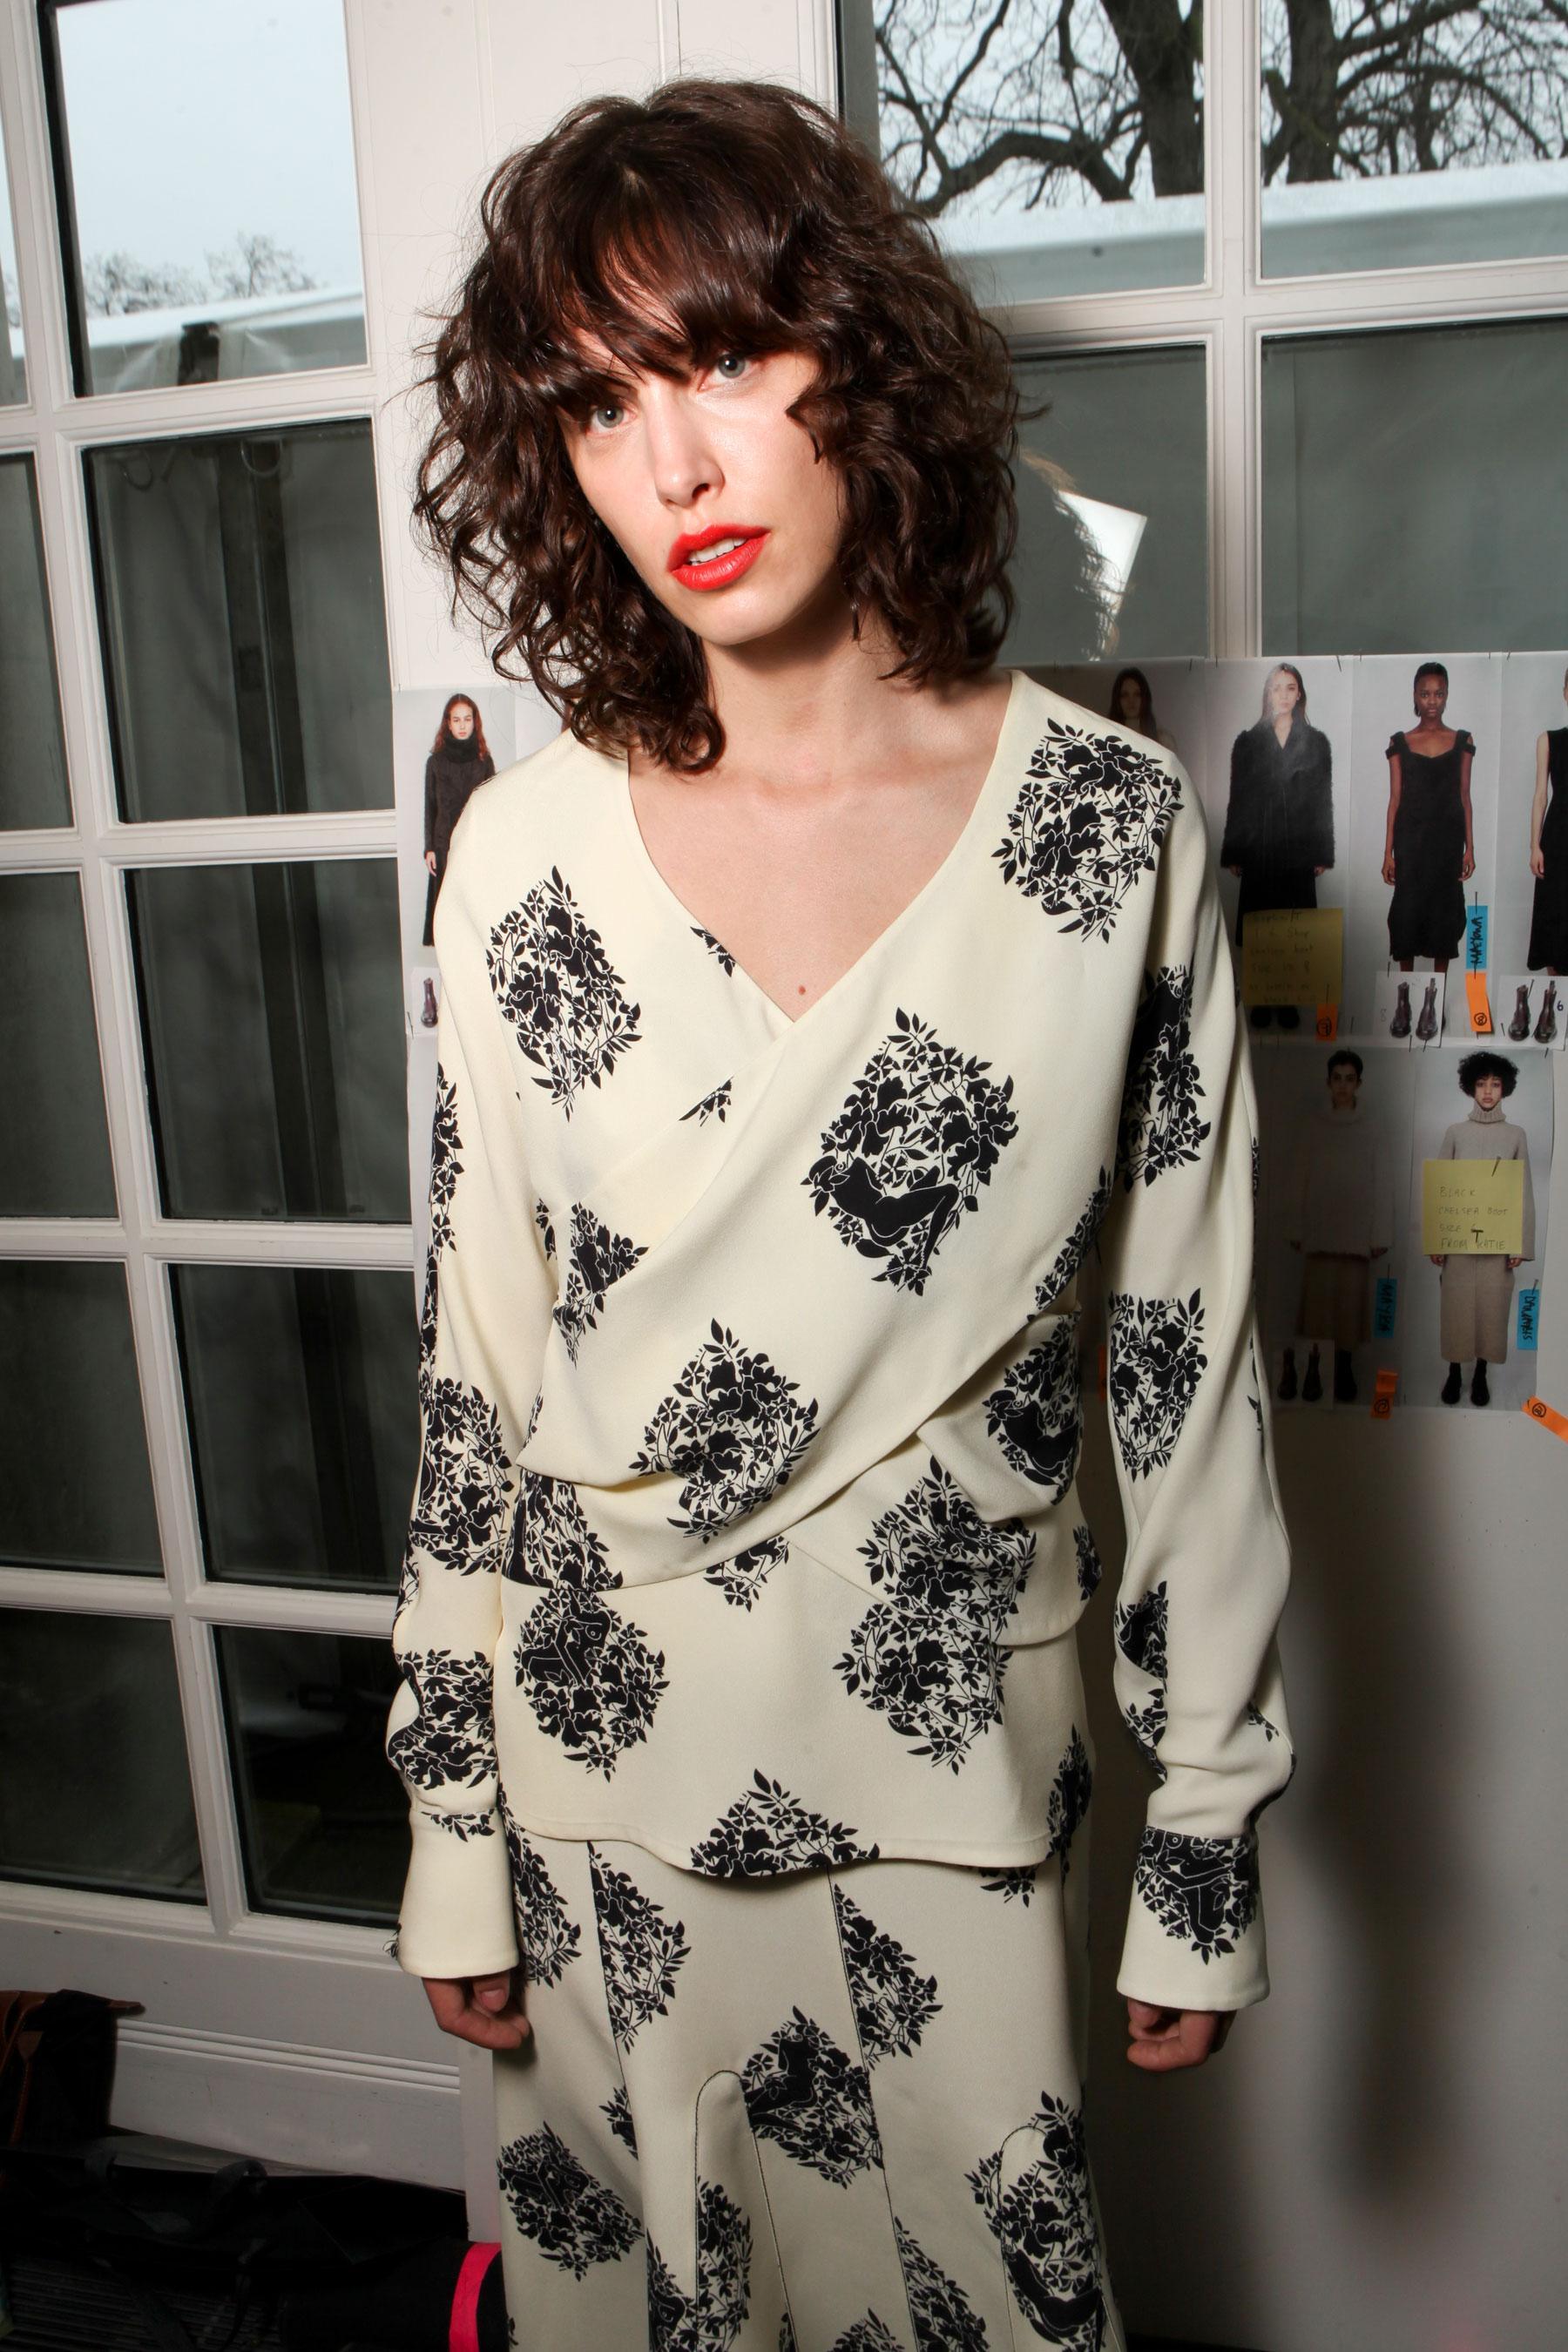 London Fashion Week - Pringle of Scotland 55